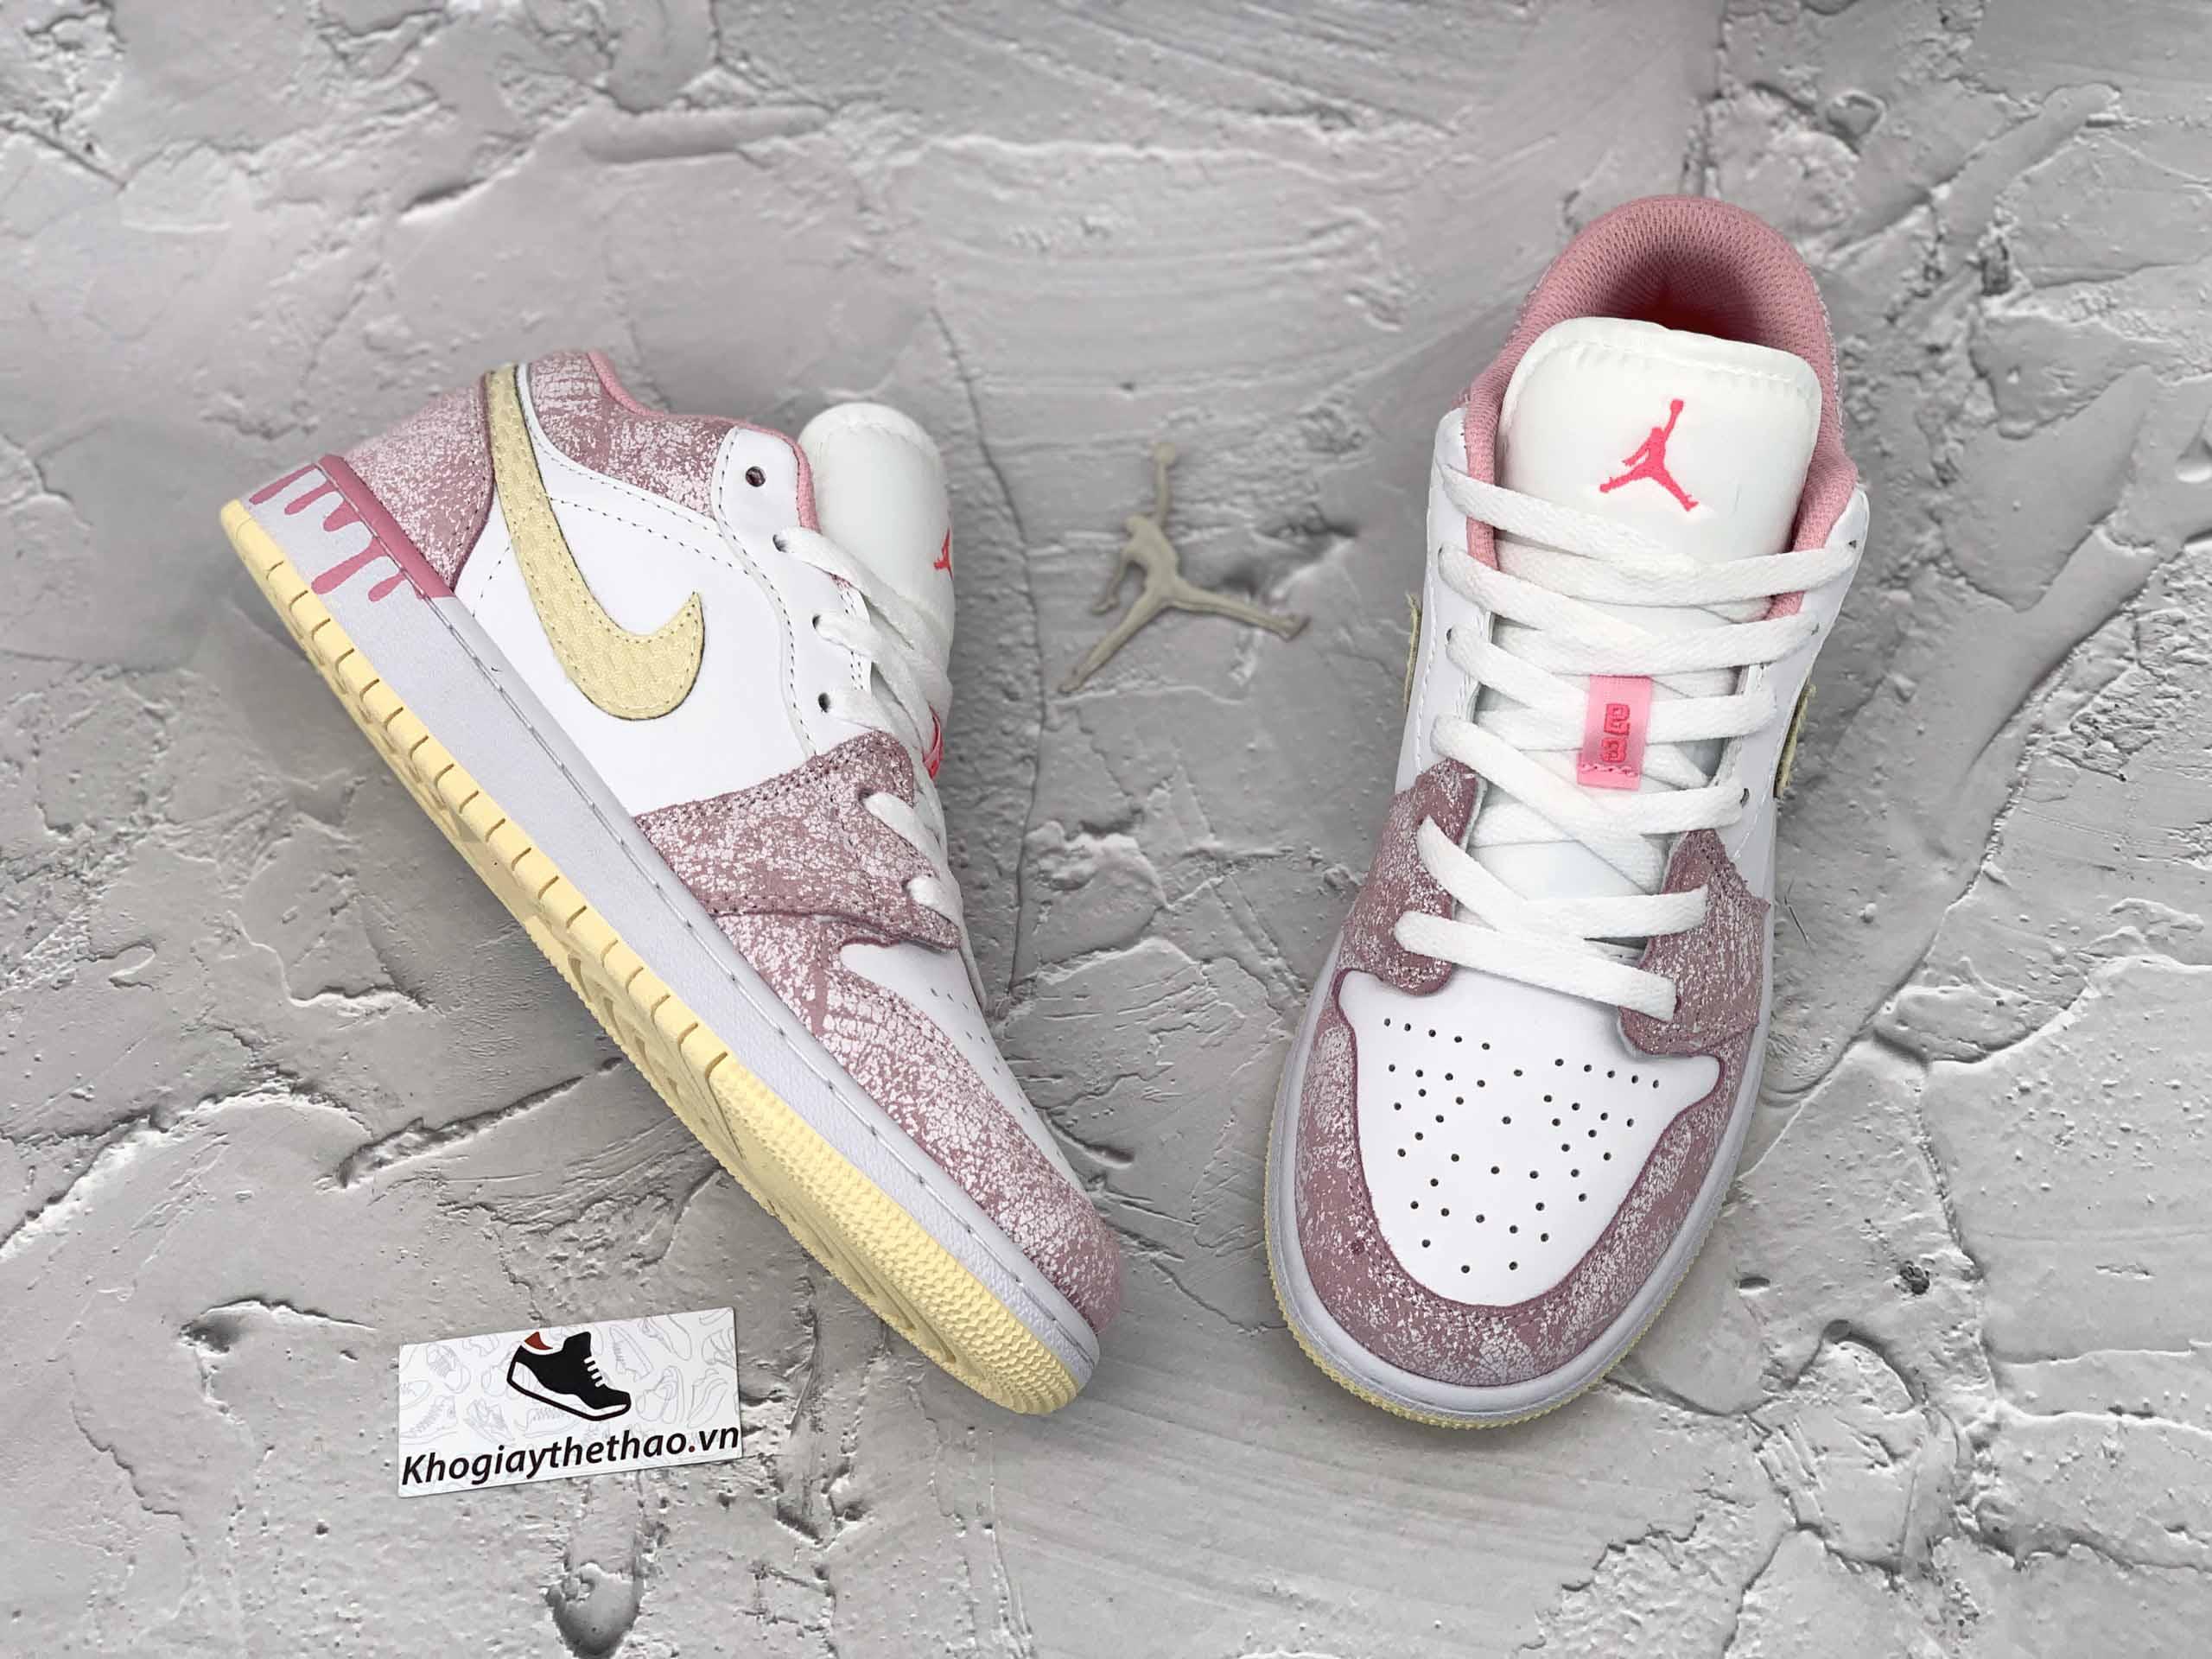 Giày Nike Air Jordan 1 thấp Paint Drip